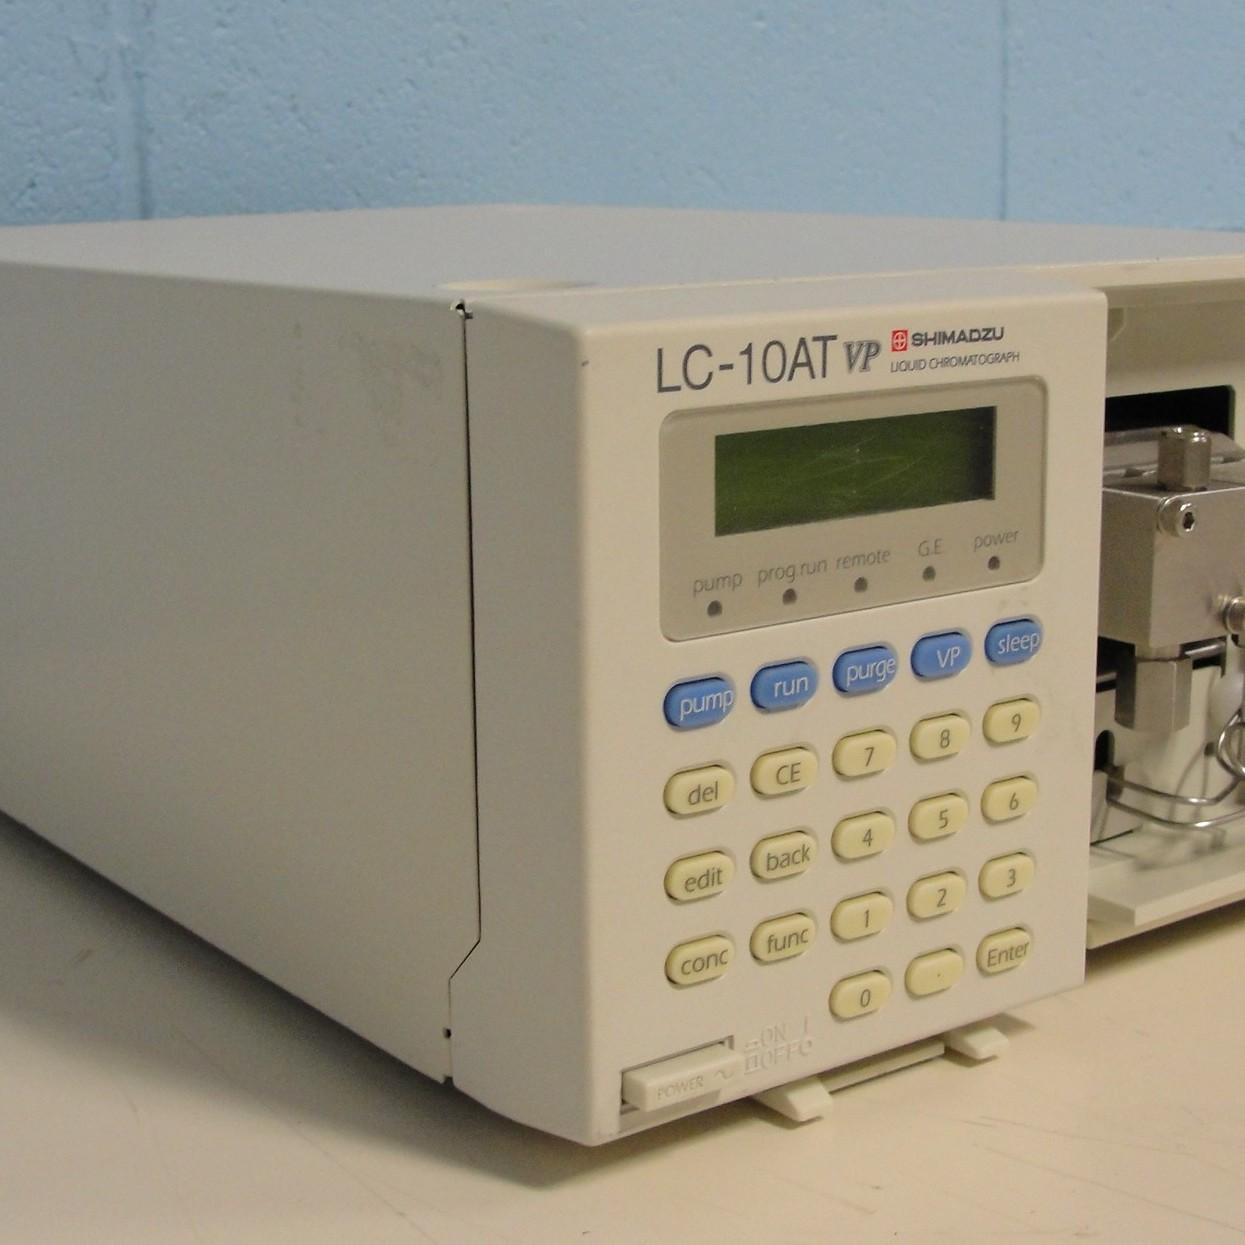 Shimadzu LC-10ATvp Pump Image